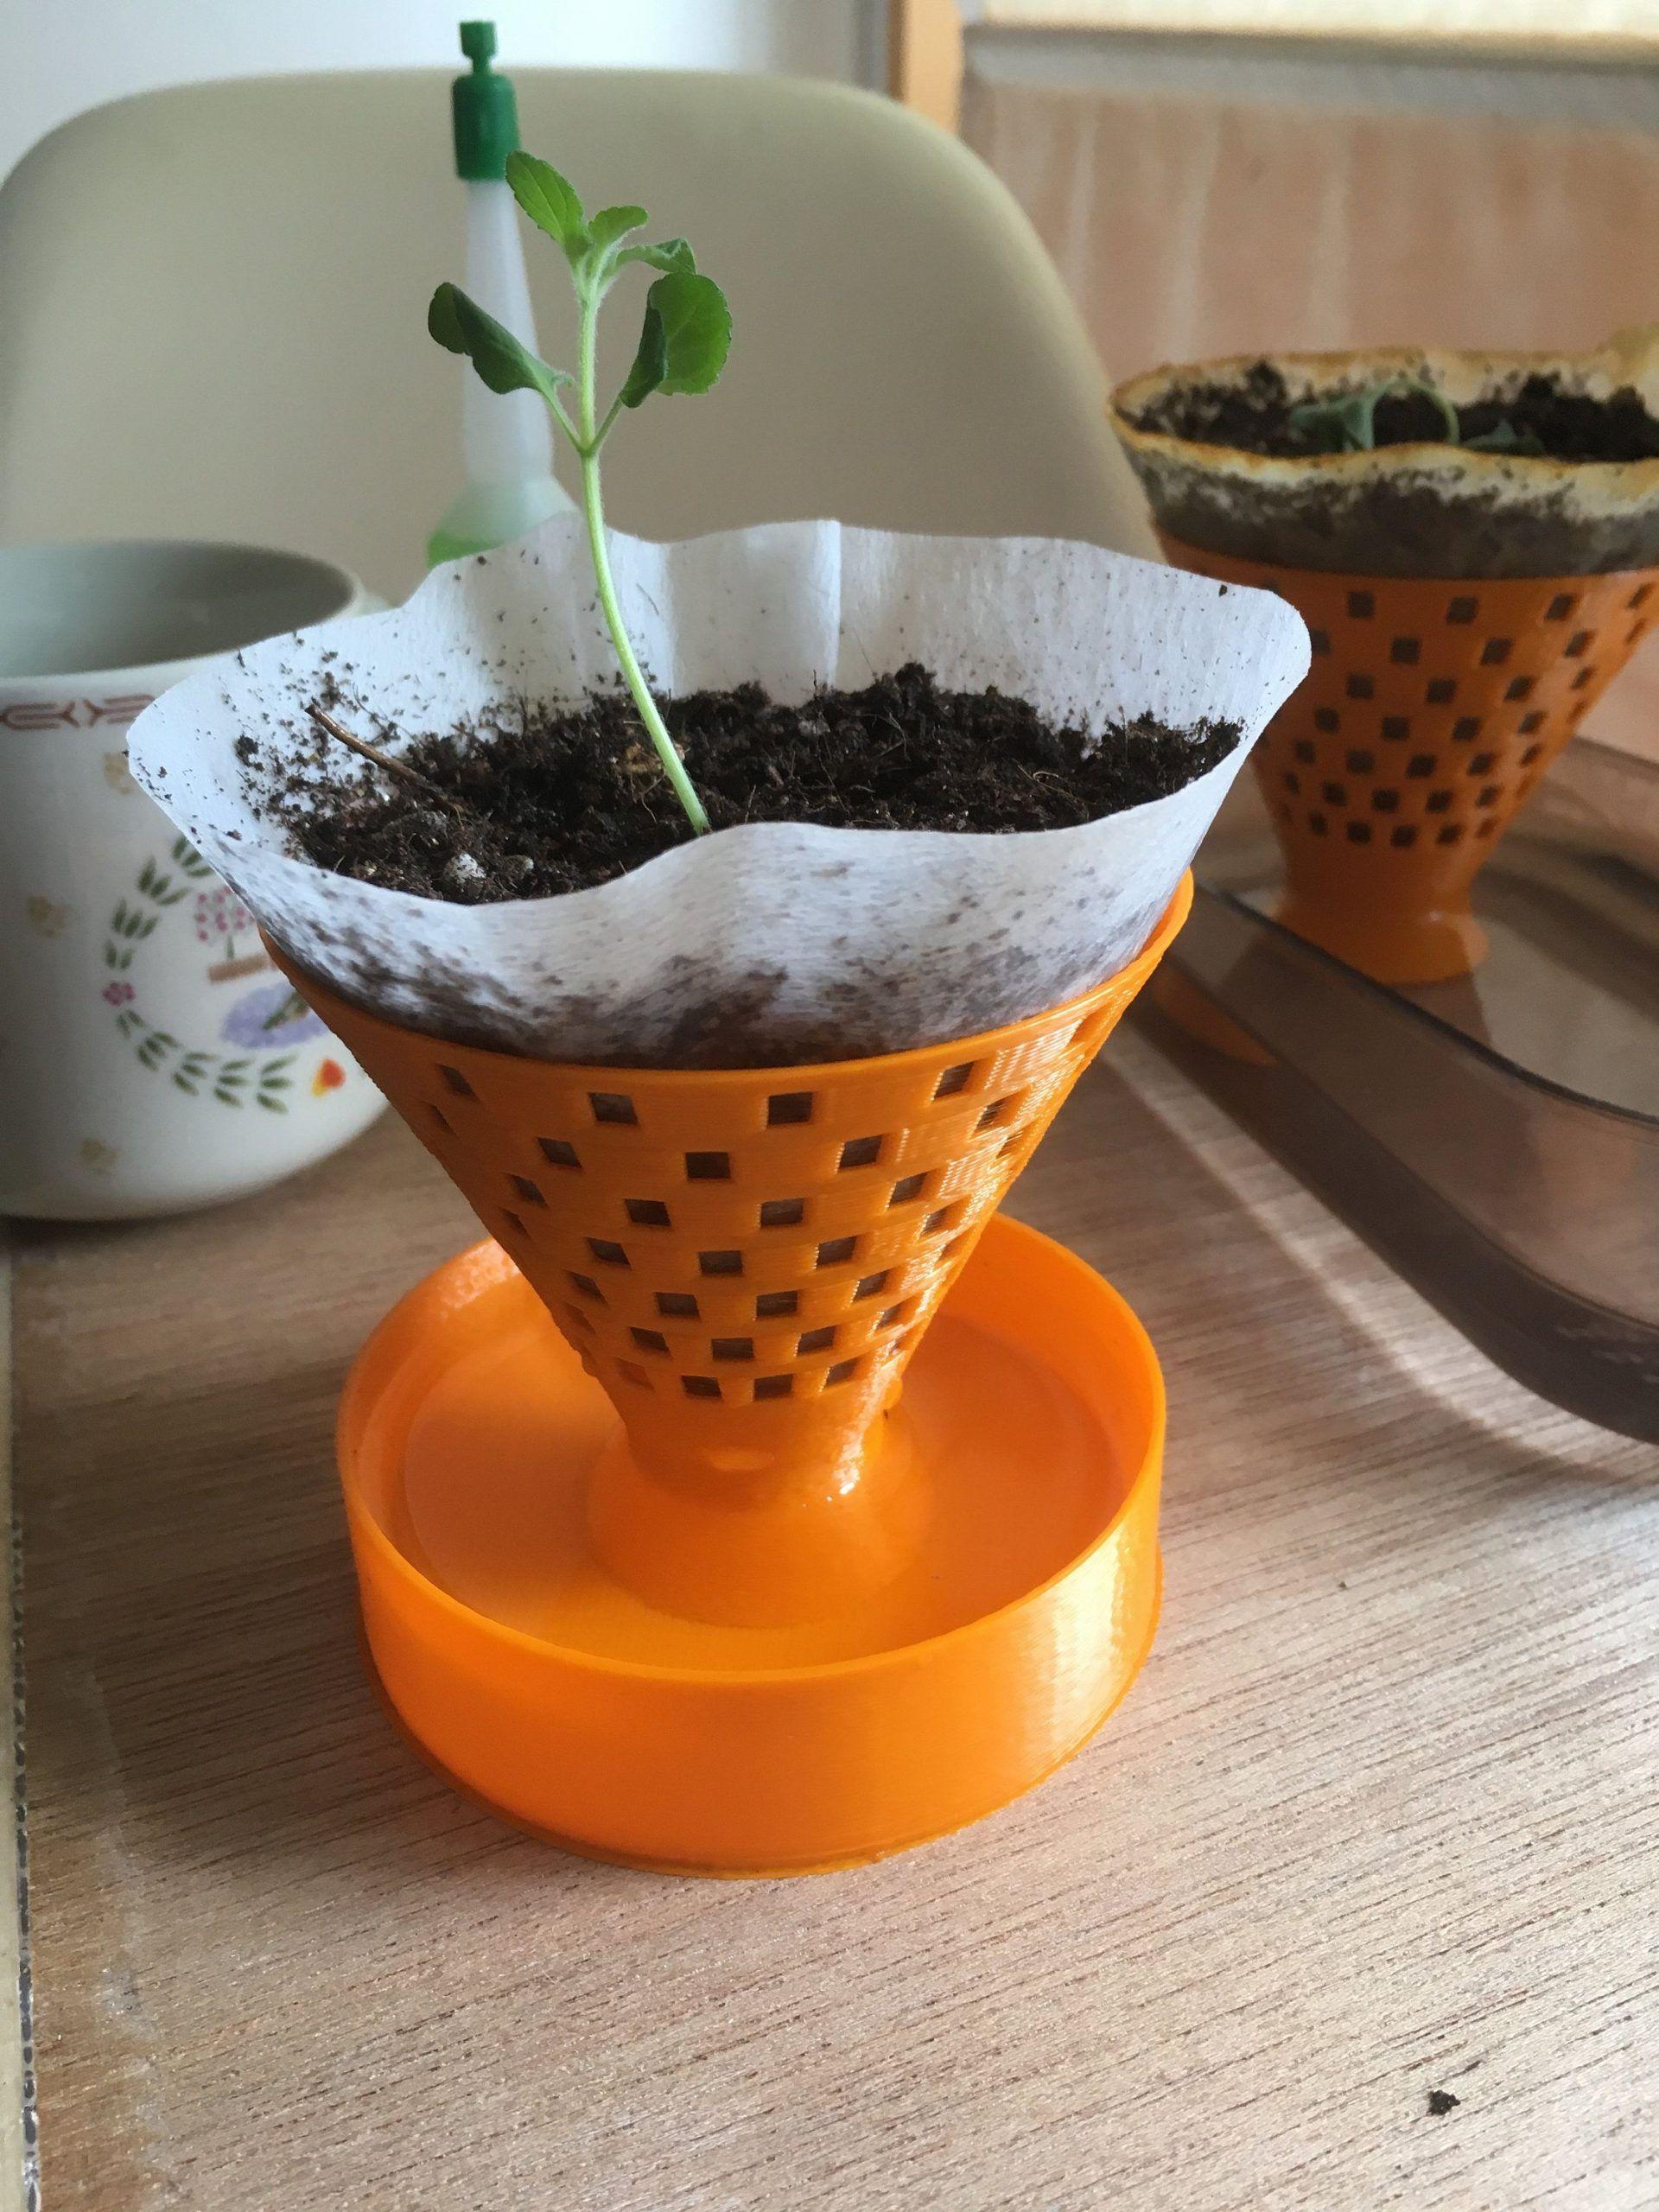 Self Watering Seedling Planter  coffee filter planter  biodegradable seedling  3D printedbiodegradable